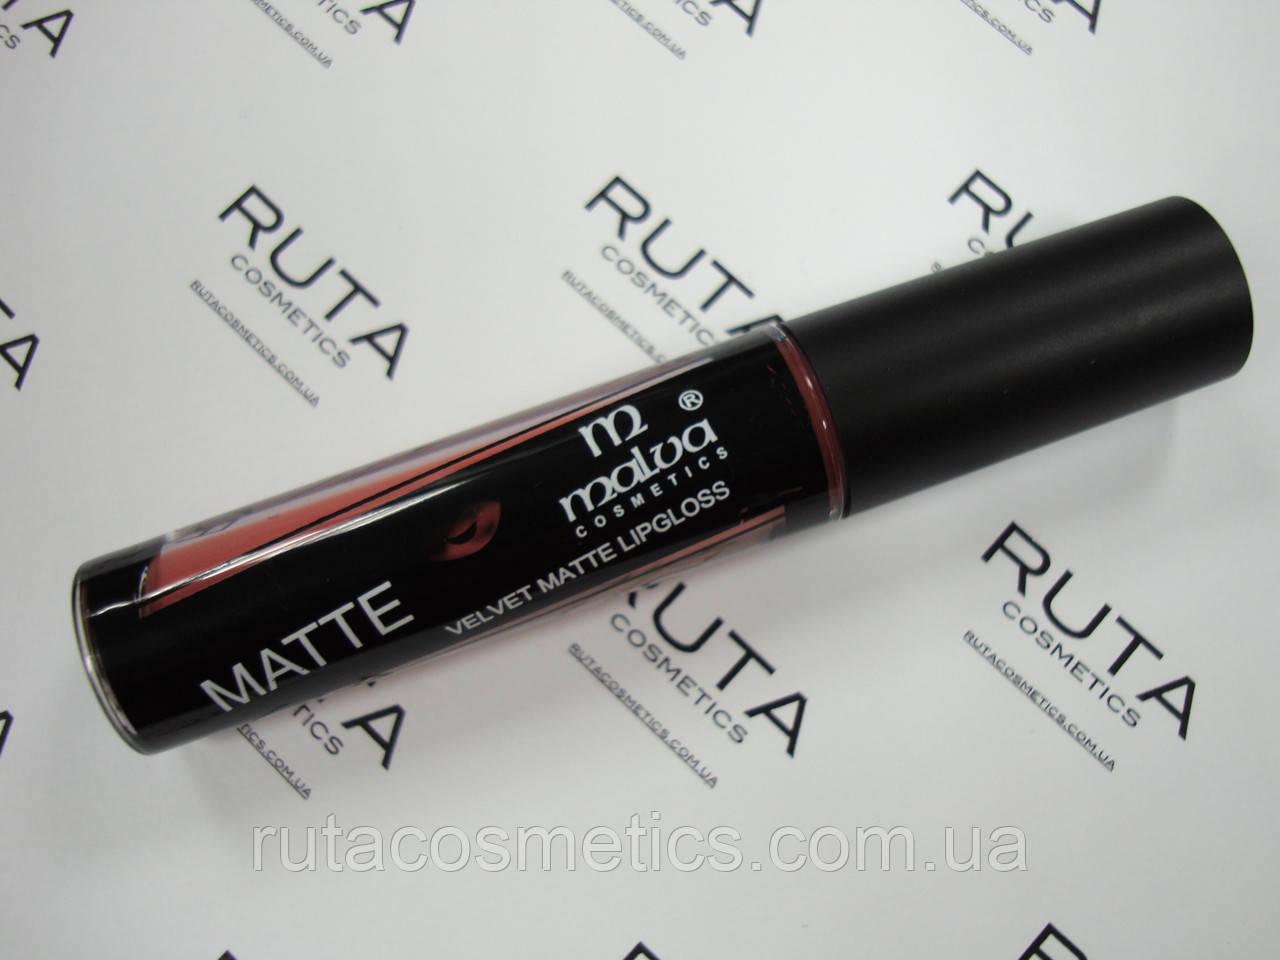 Malva cosmetics Velvet matte lipgloss жидкая матовая помада 12